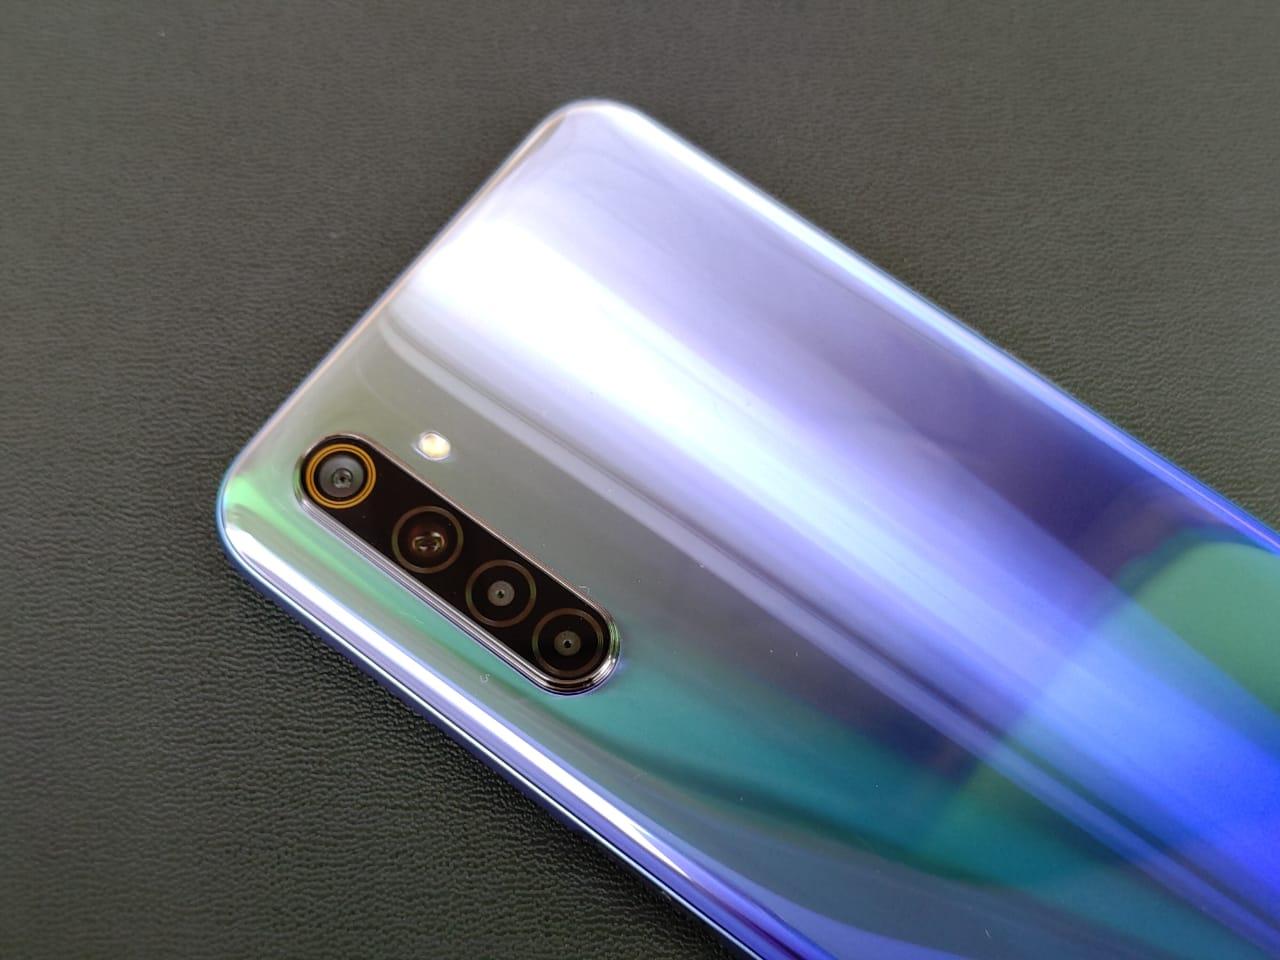 Smartphone Gaming Rp3 Juta, Refresh Rate 90Hz